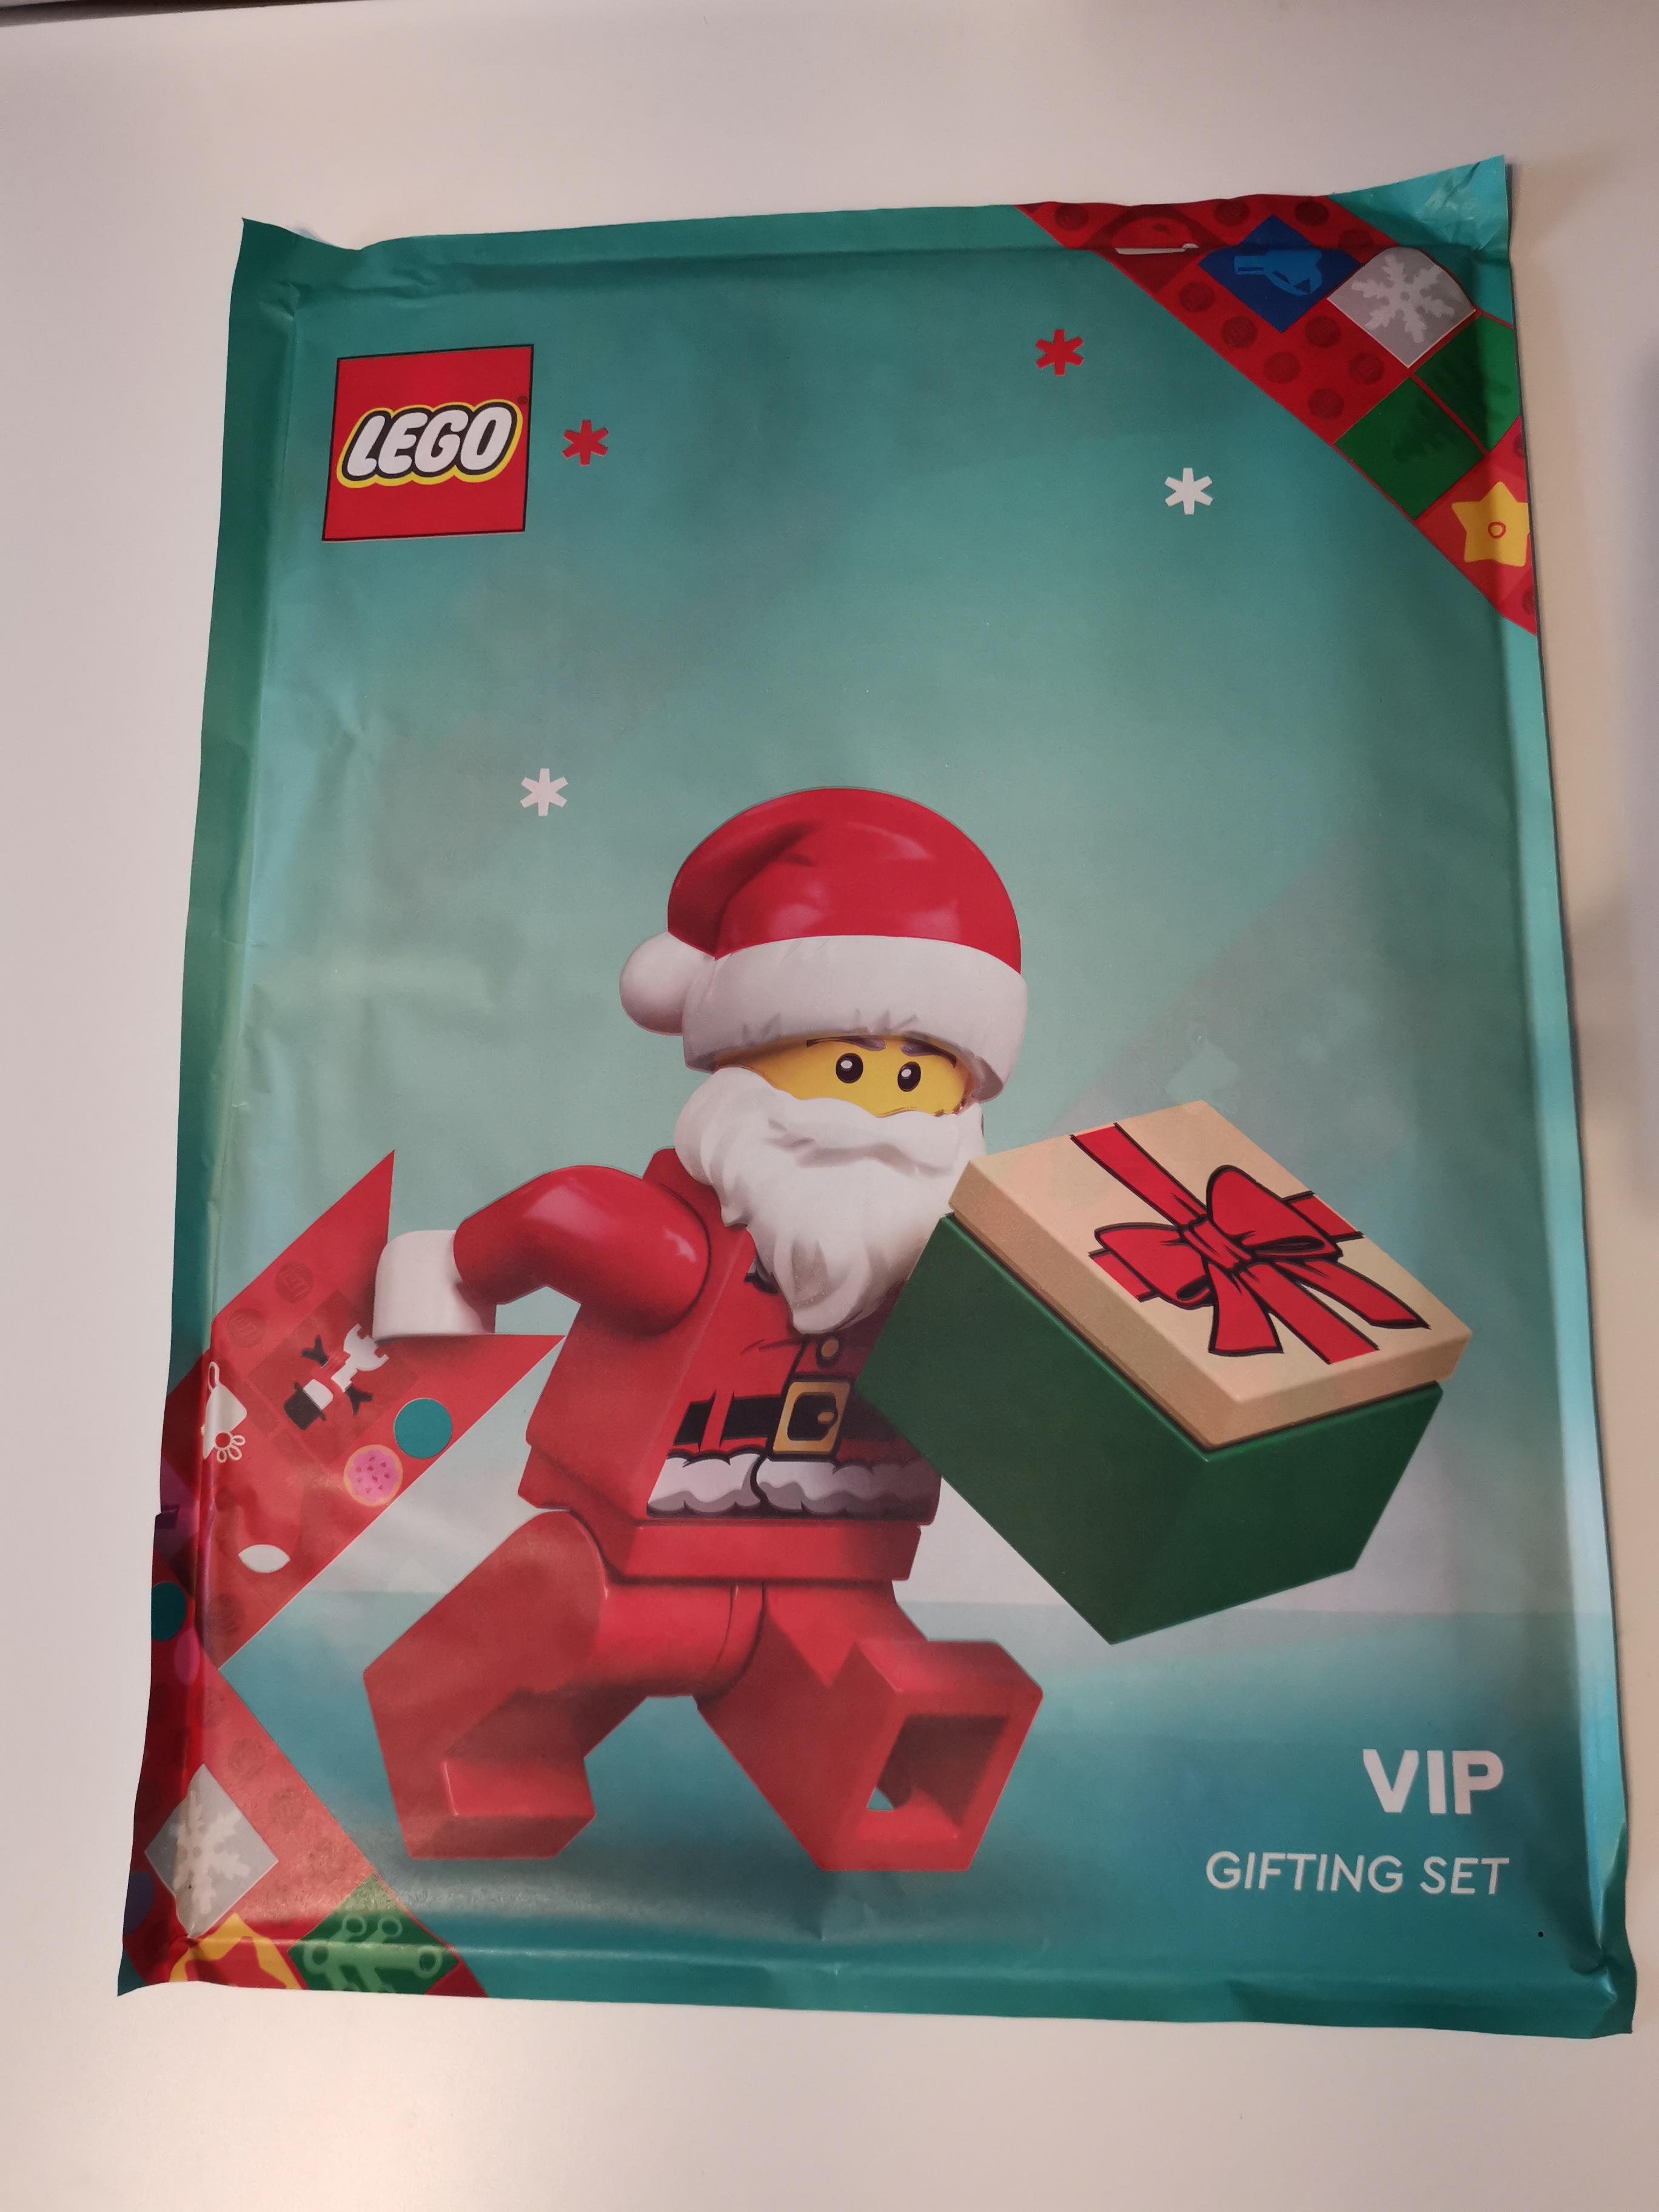 [lokal Hannover Hamburg] LEGO VIP Gifting Set im Lego Store